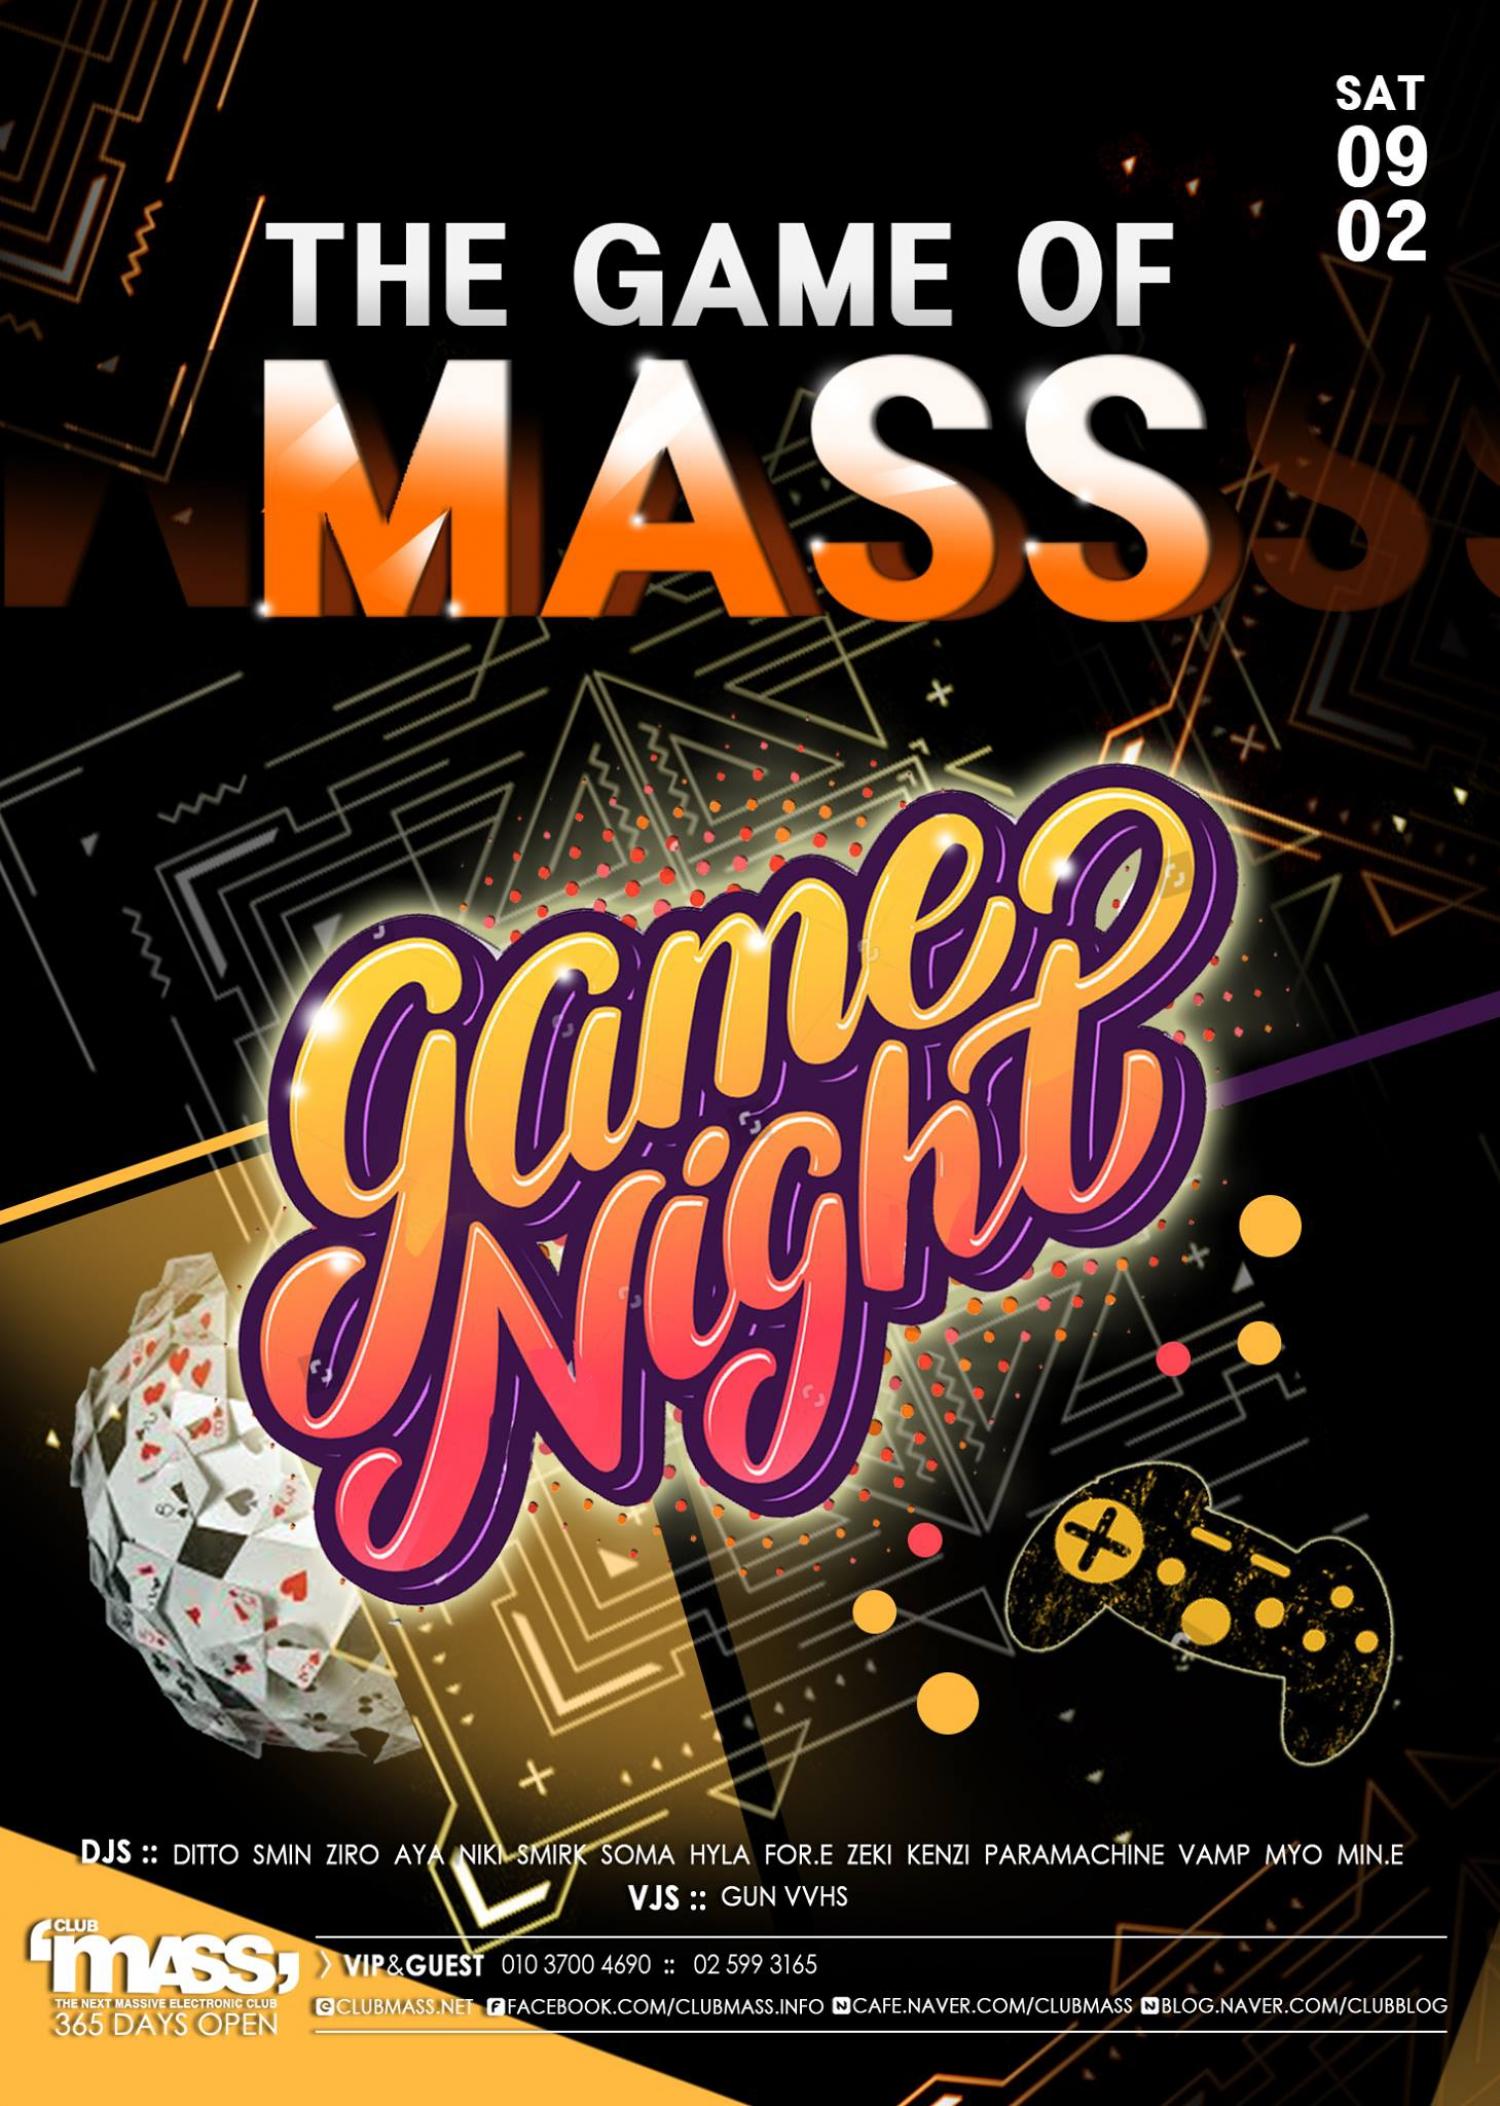 Game Night at Club Mass